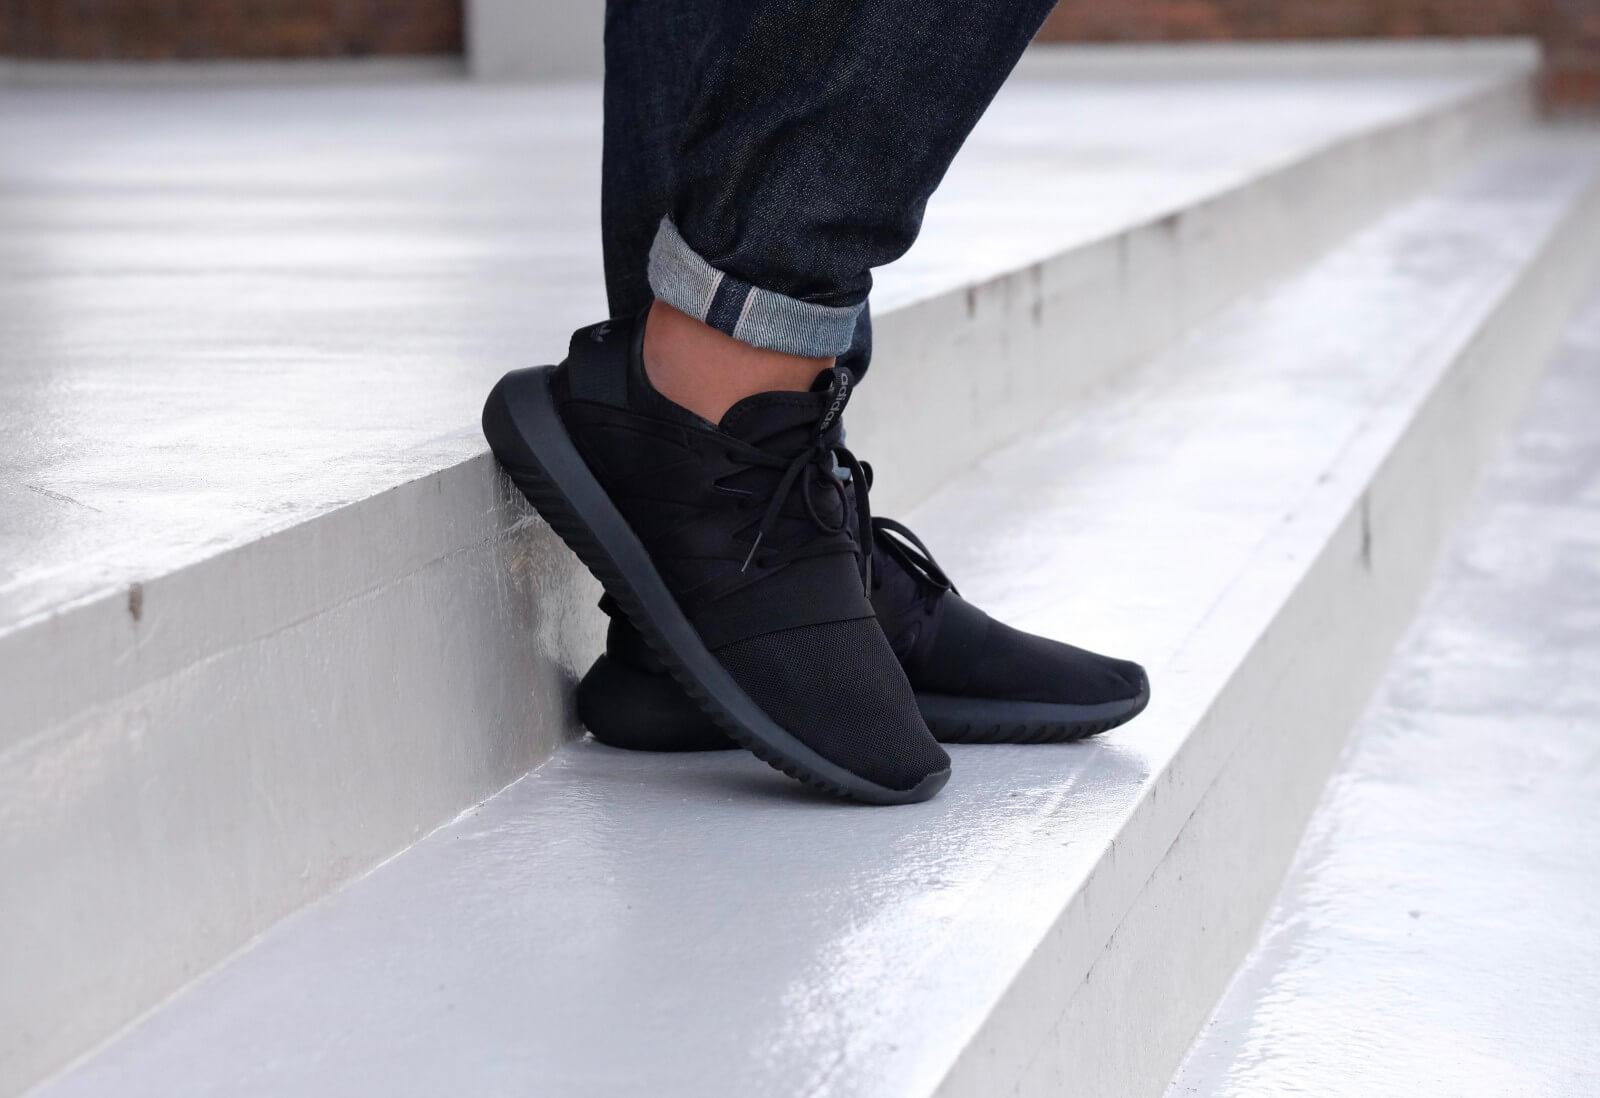 Adidas Tubular Viral W Black - S75912